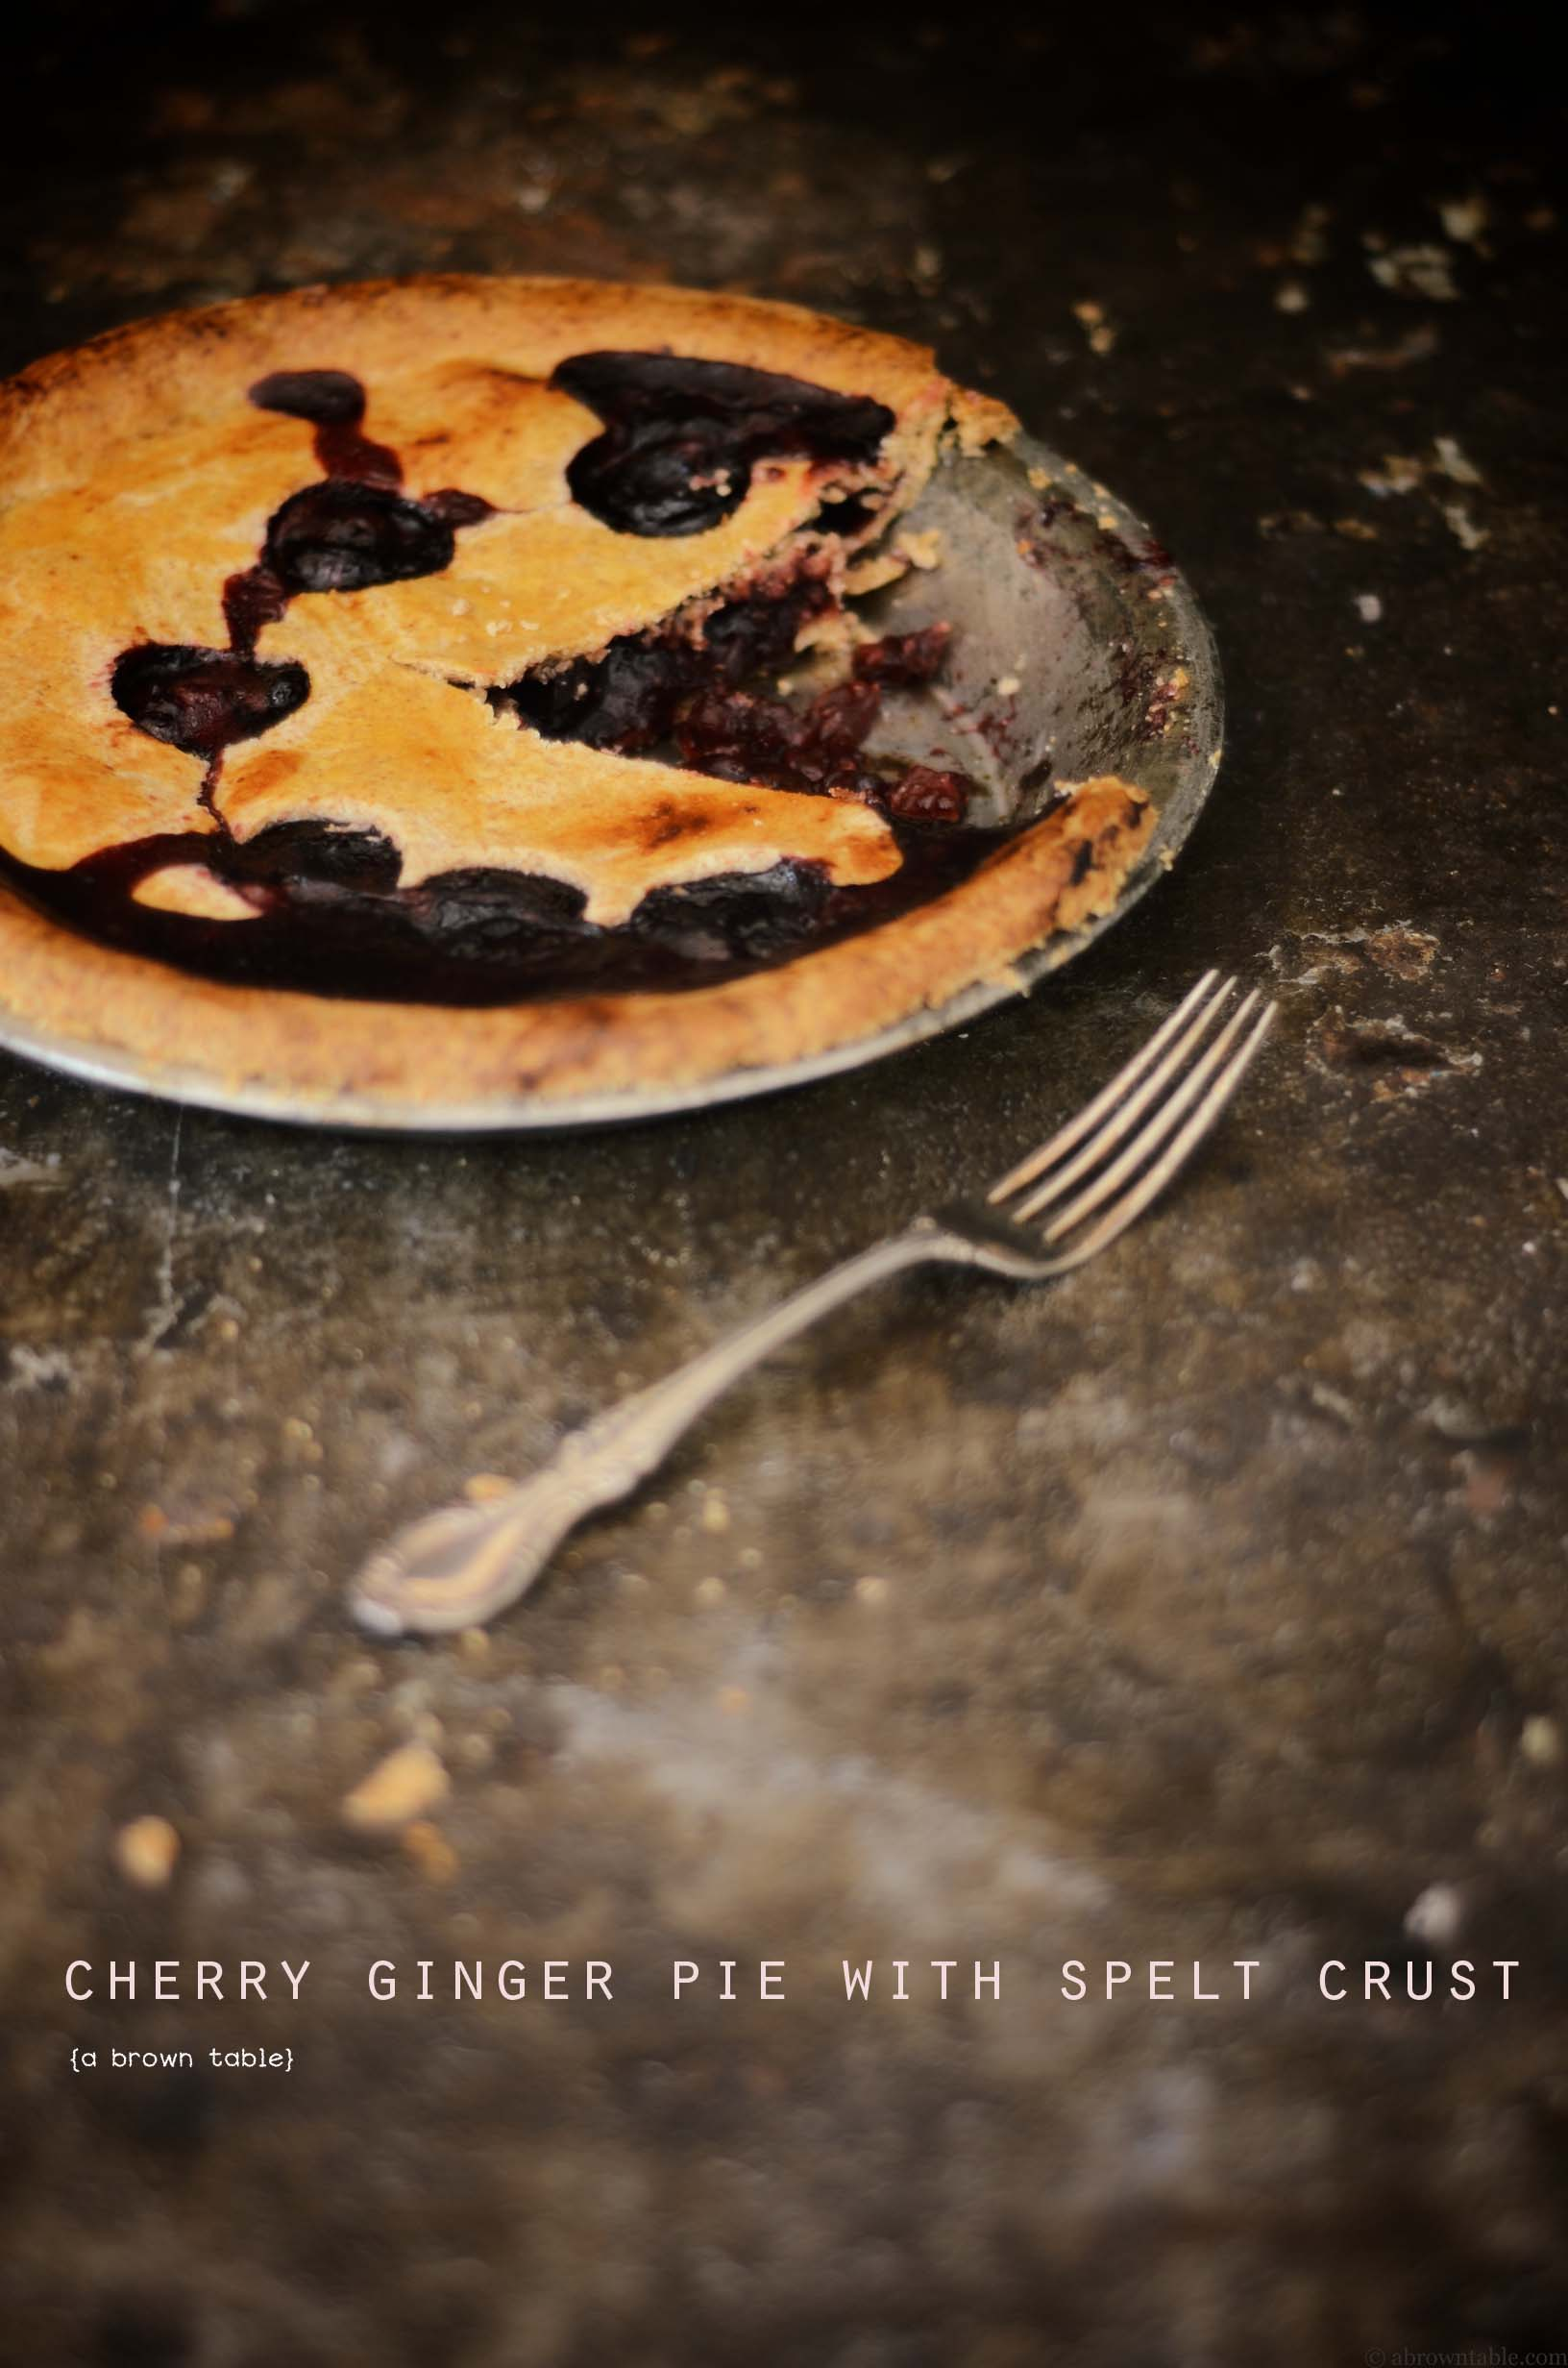 cherry ginger pie with spelt crust